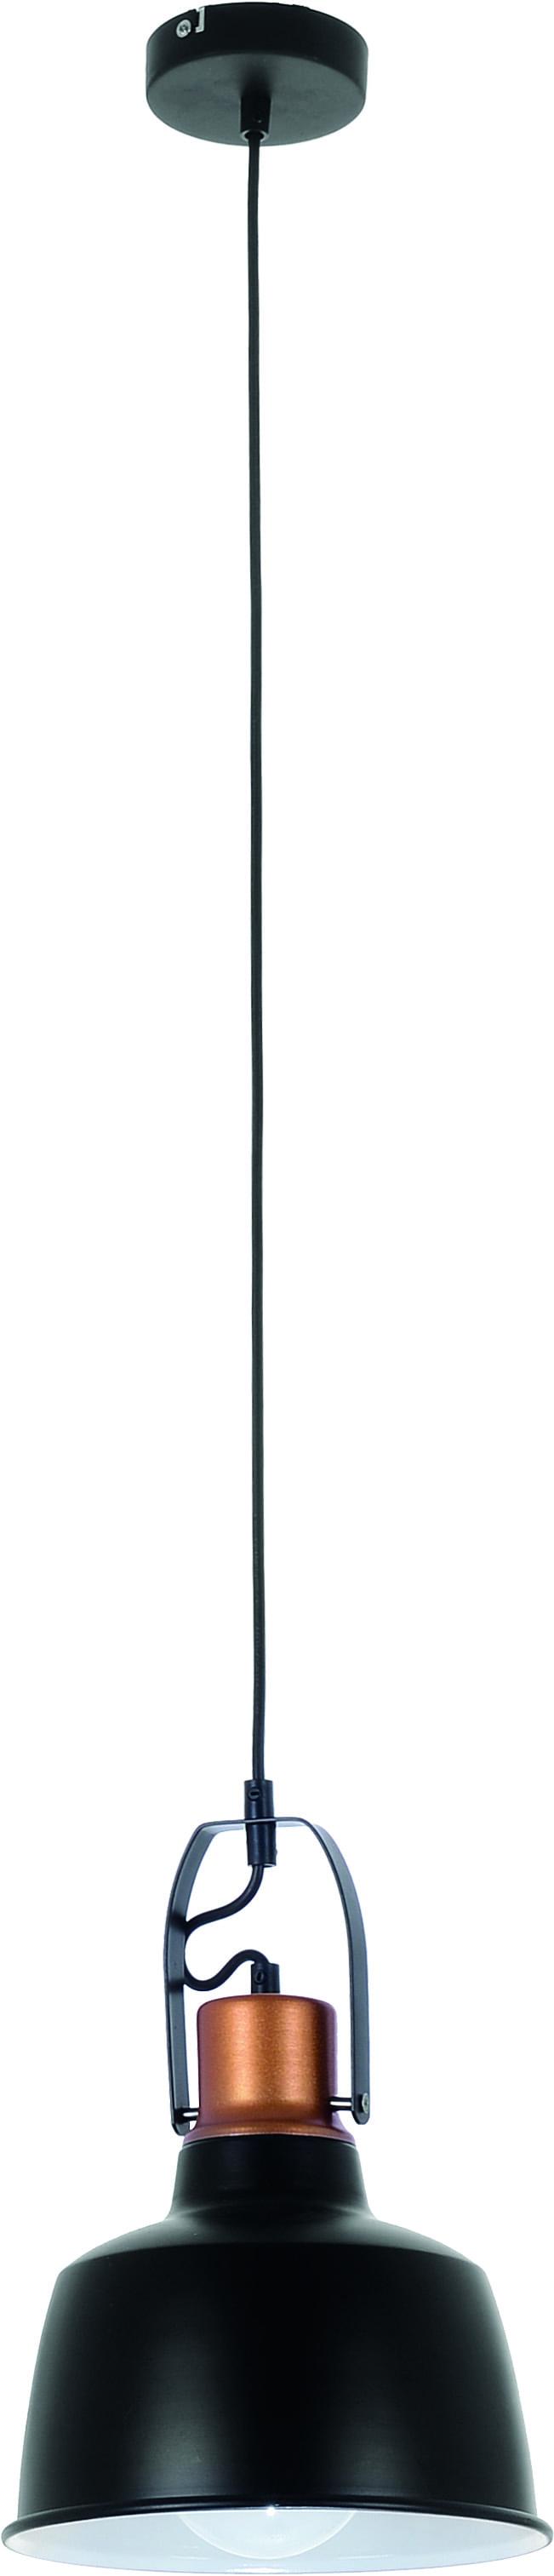 Lampa sufitowa Herman w kolorze czarnym